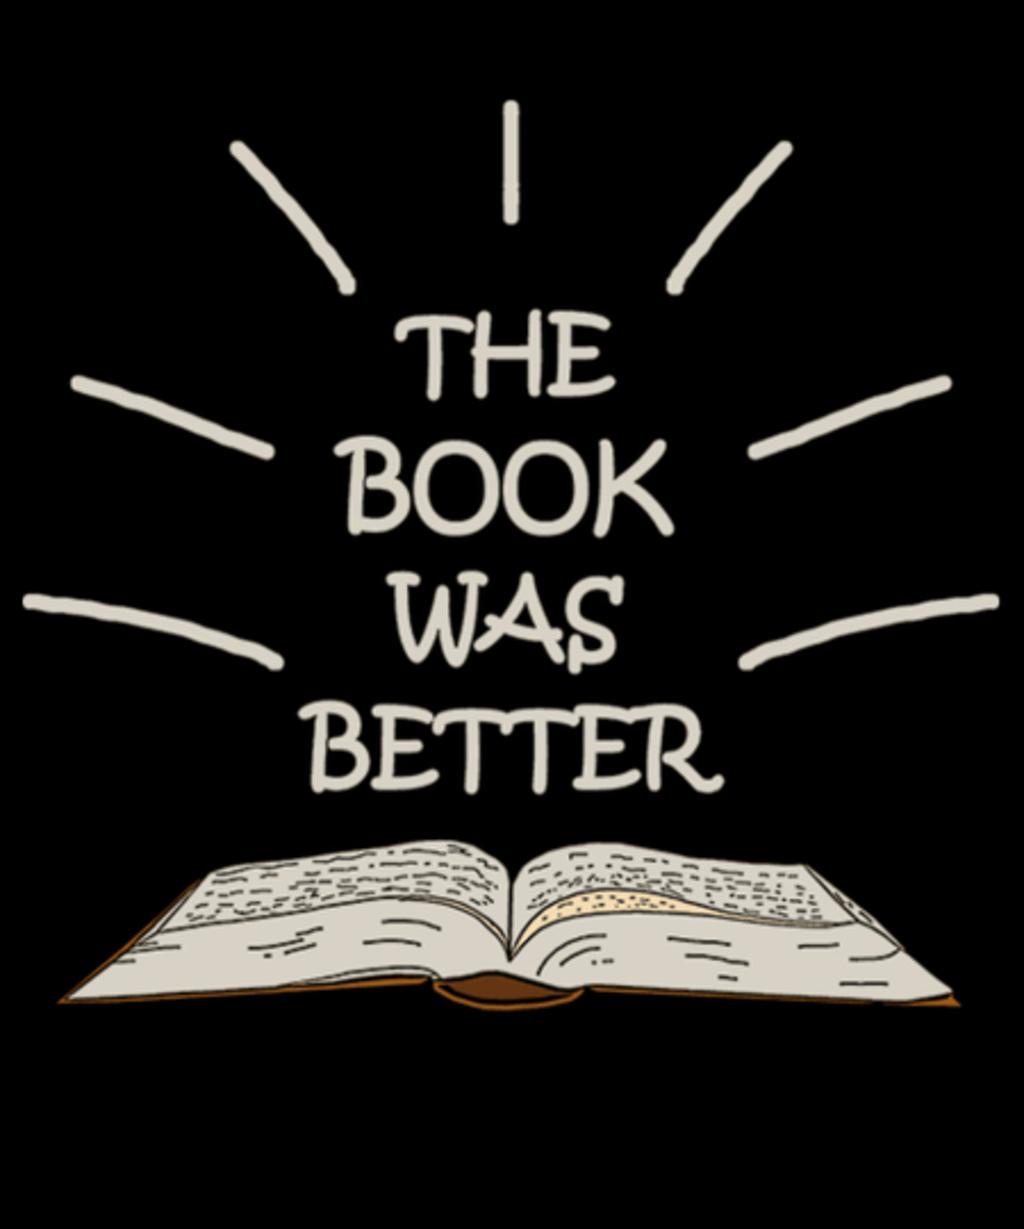 Qwertee: The book was better